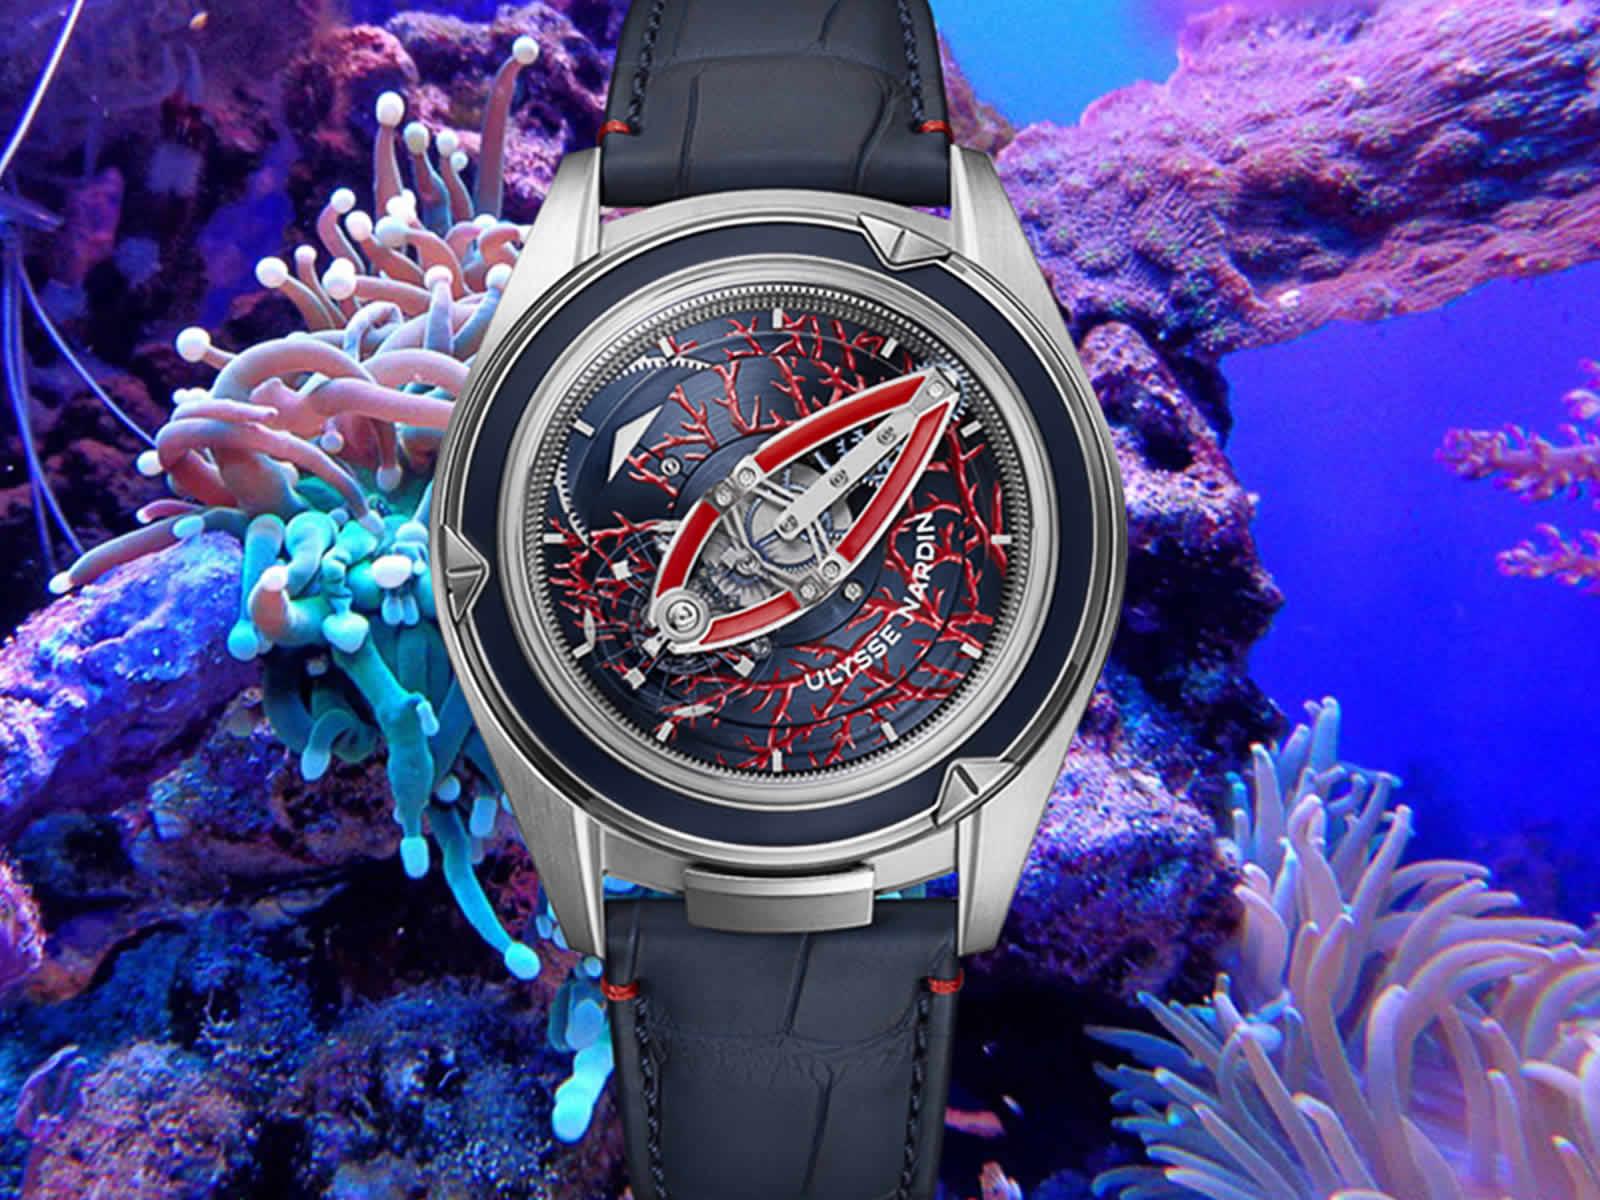 ulysse-nardin-freak-vision-coral-bay-3-.jpg